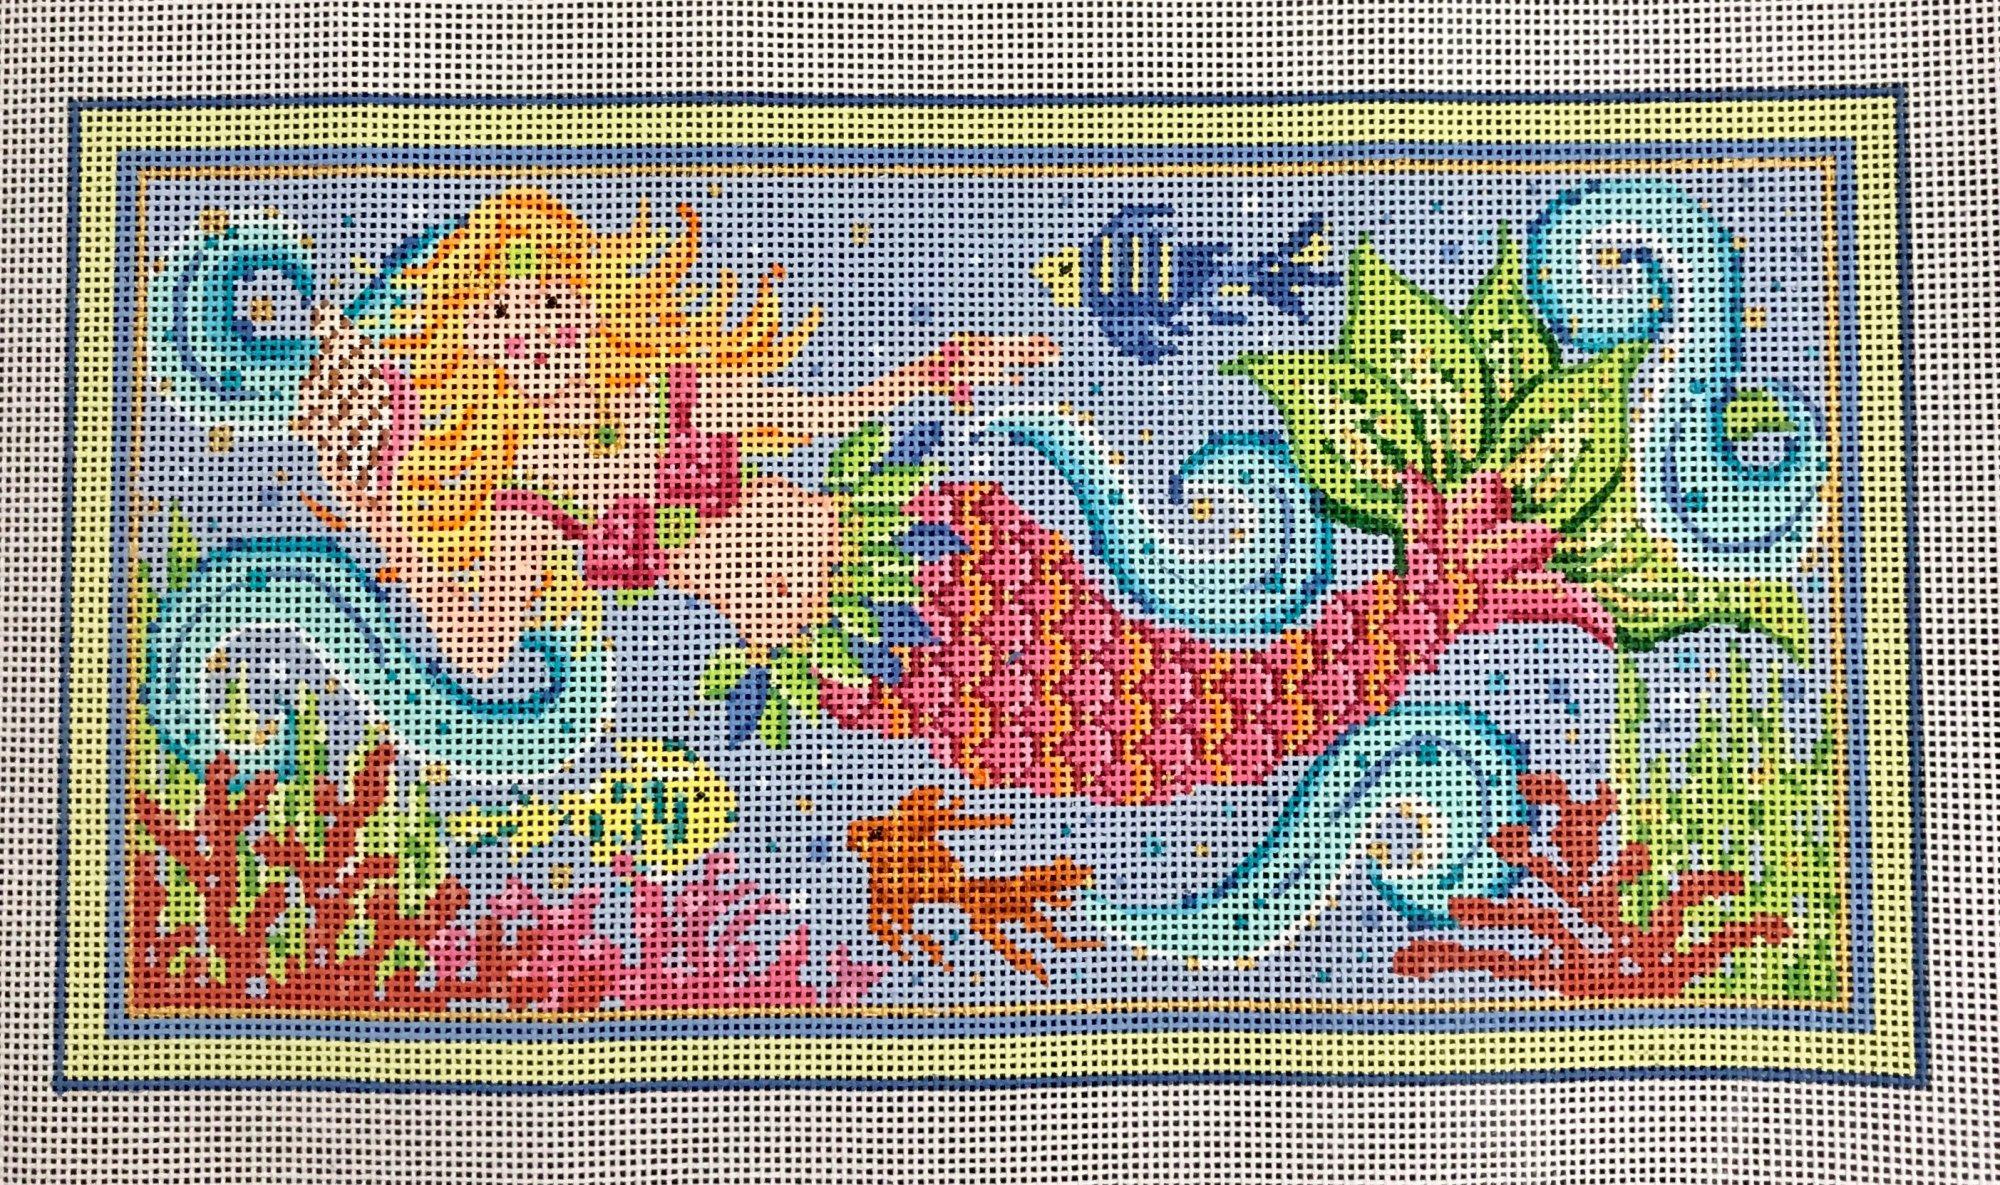 Ginger Spice Mermaid